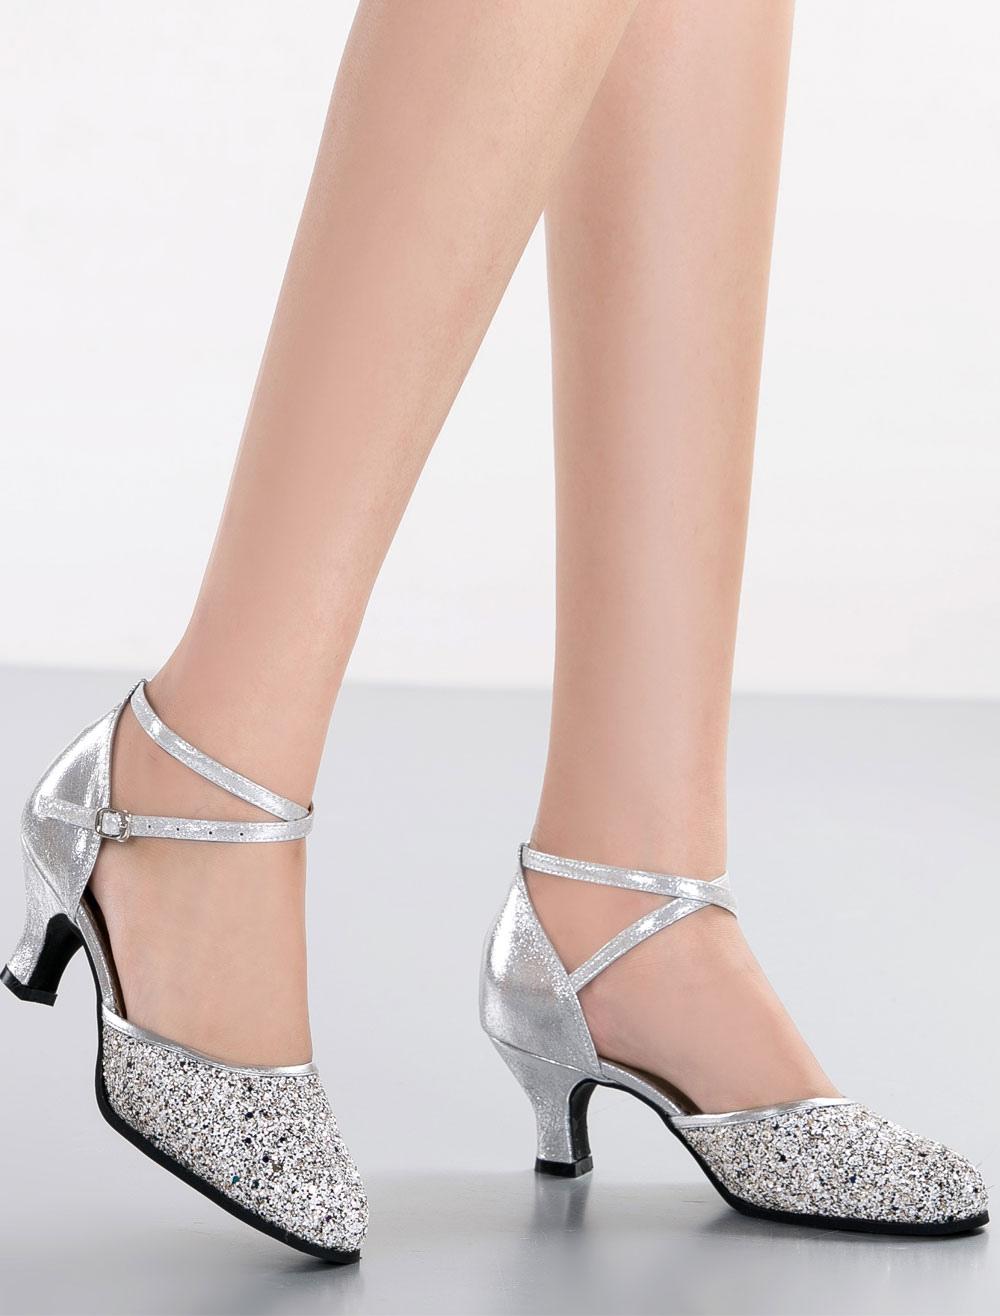 Silver Dance Shoes 2018 Glitter Round Toe Criss Cross Latin Dancing Shoes Ballroom Shoes